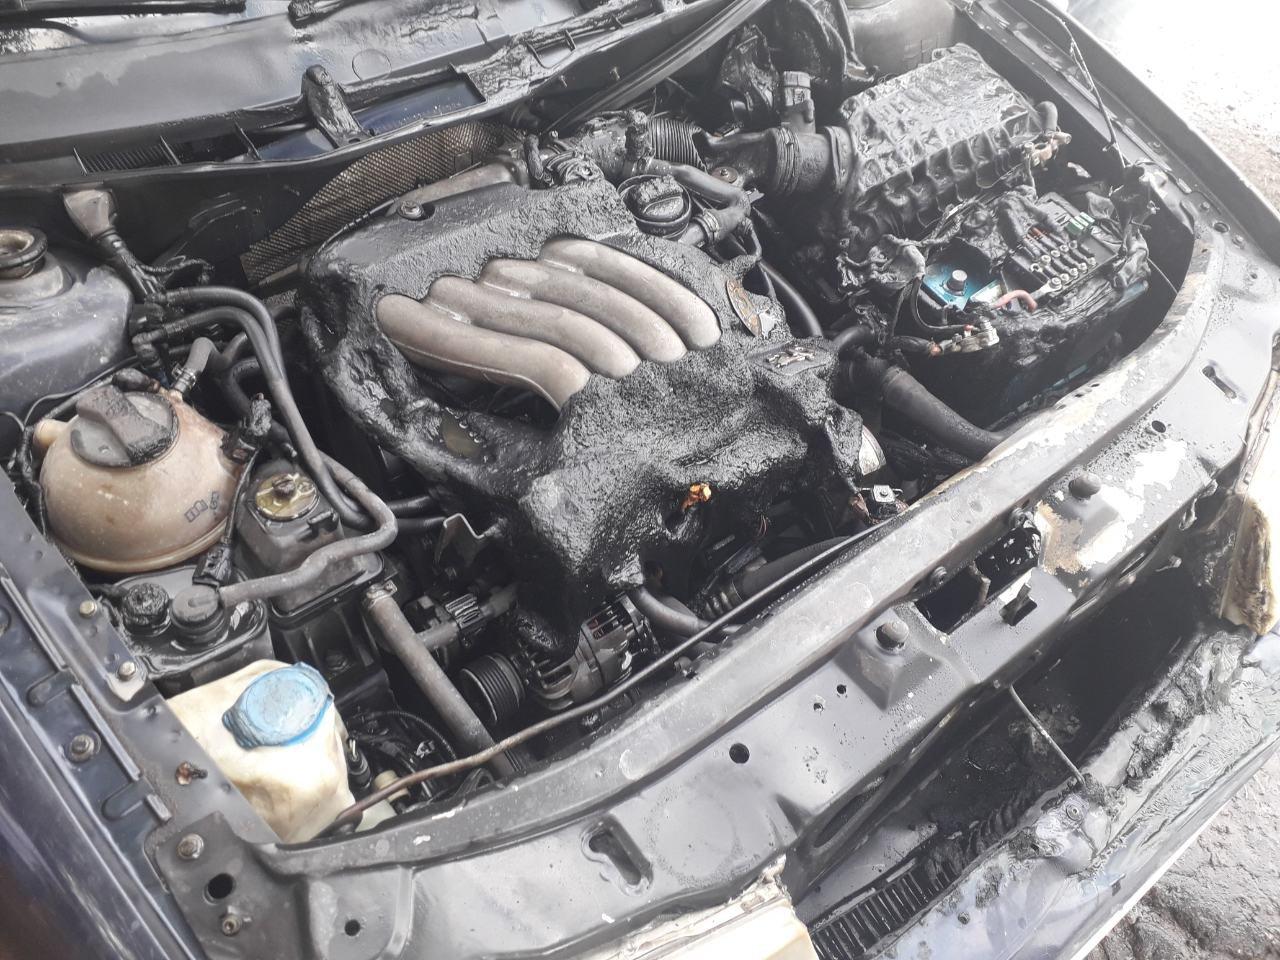 На Николаевщине спасатели потушили пожар автомобиля, - ФОТО, фото-2